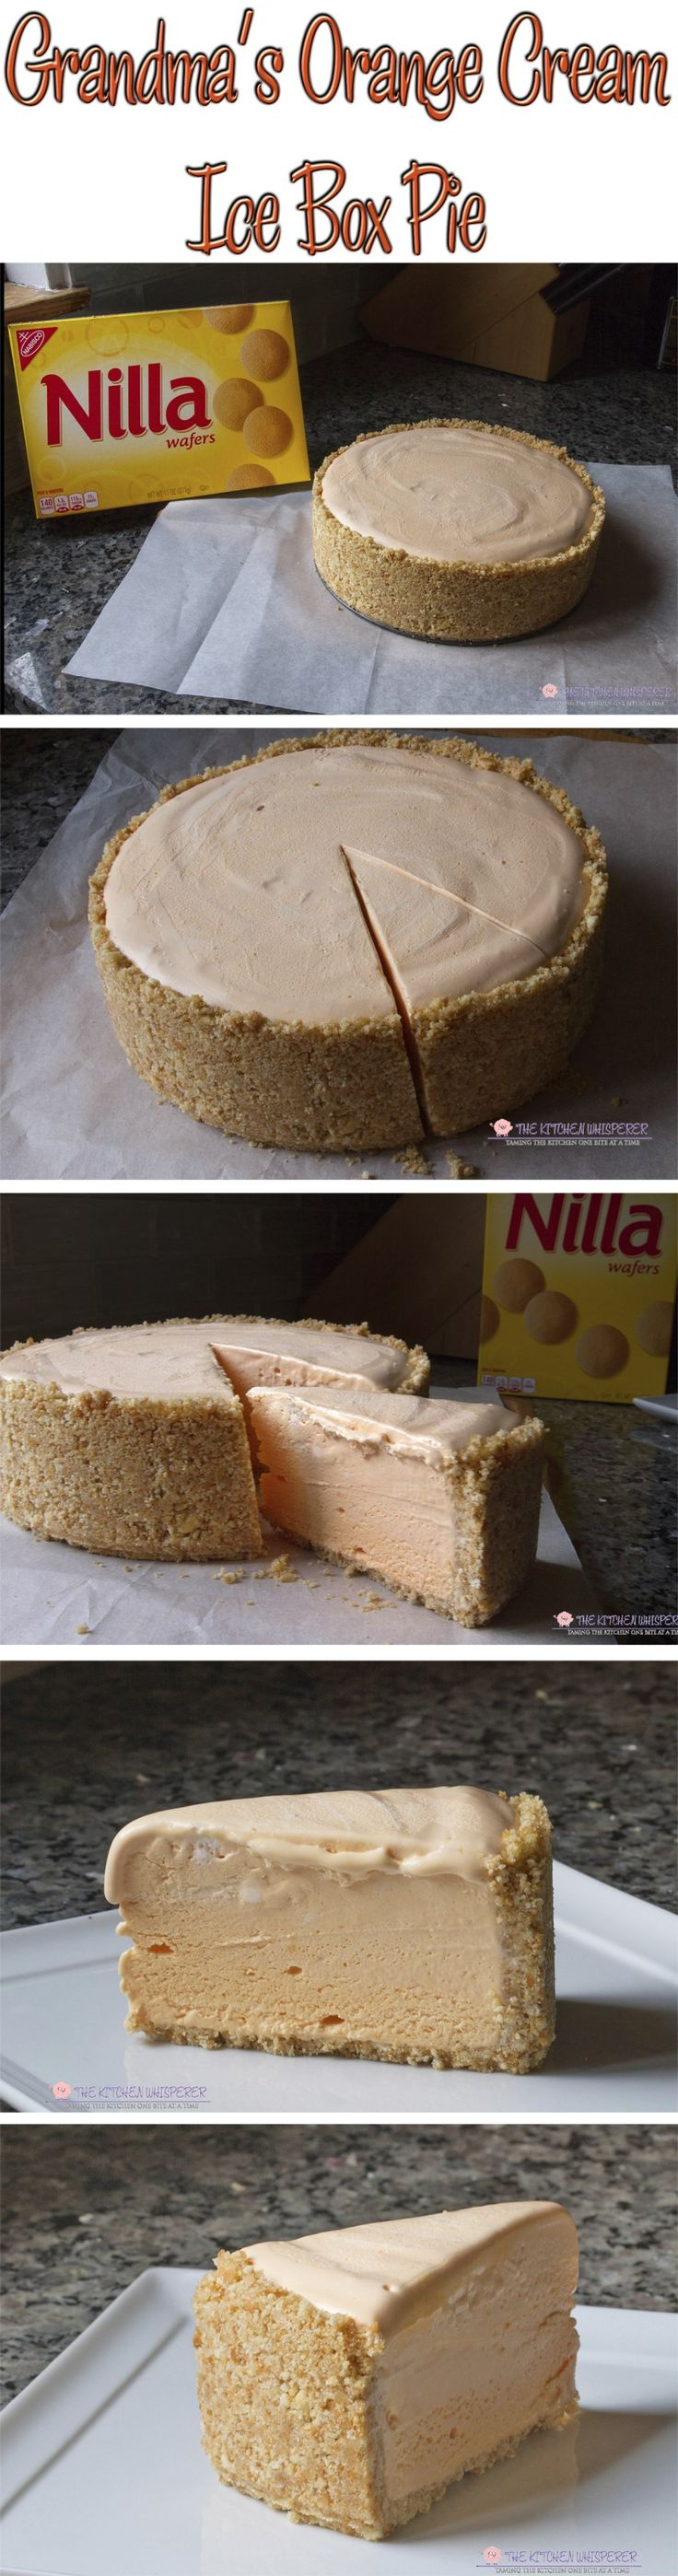 Grandma's Orange Cream Ice Box Pie - My Grandmother's orange cream ice box pie with NILLA Wafters crust is luscious, creamy, dreamy and no bake! It's the perfect warm weather pie!